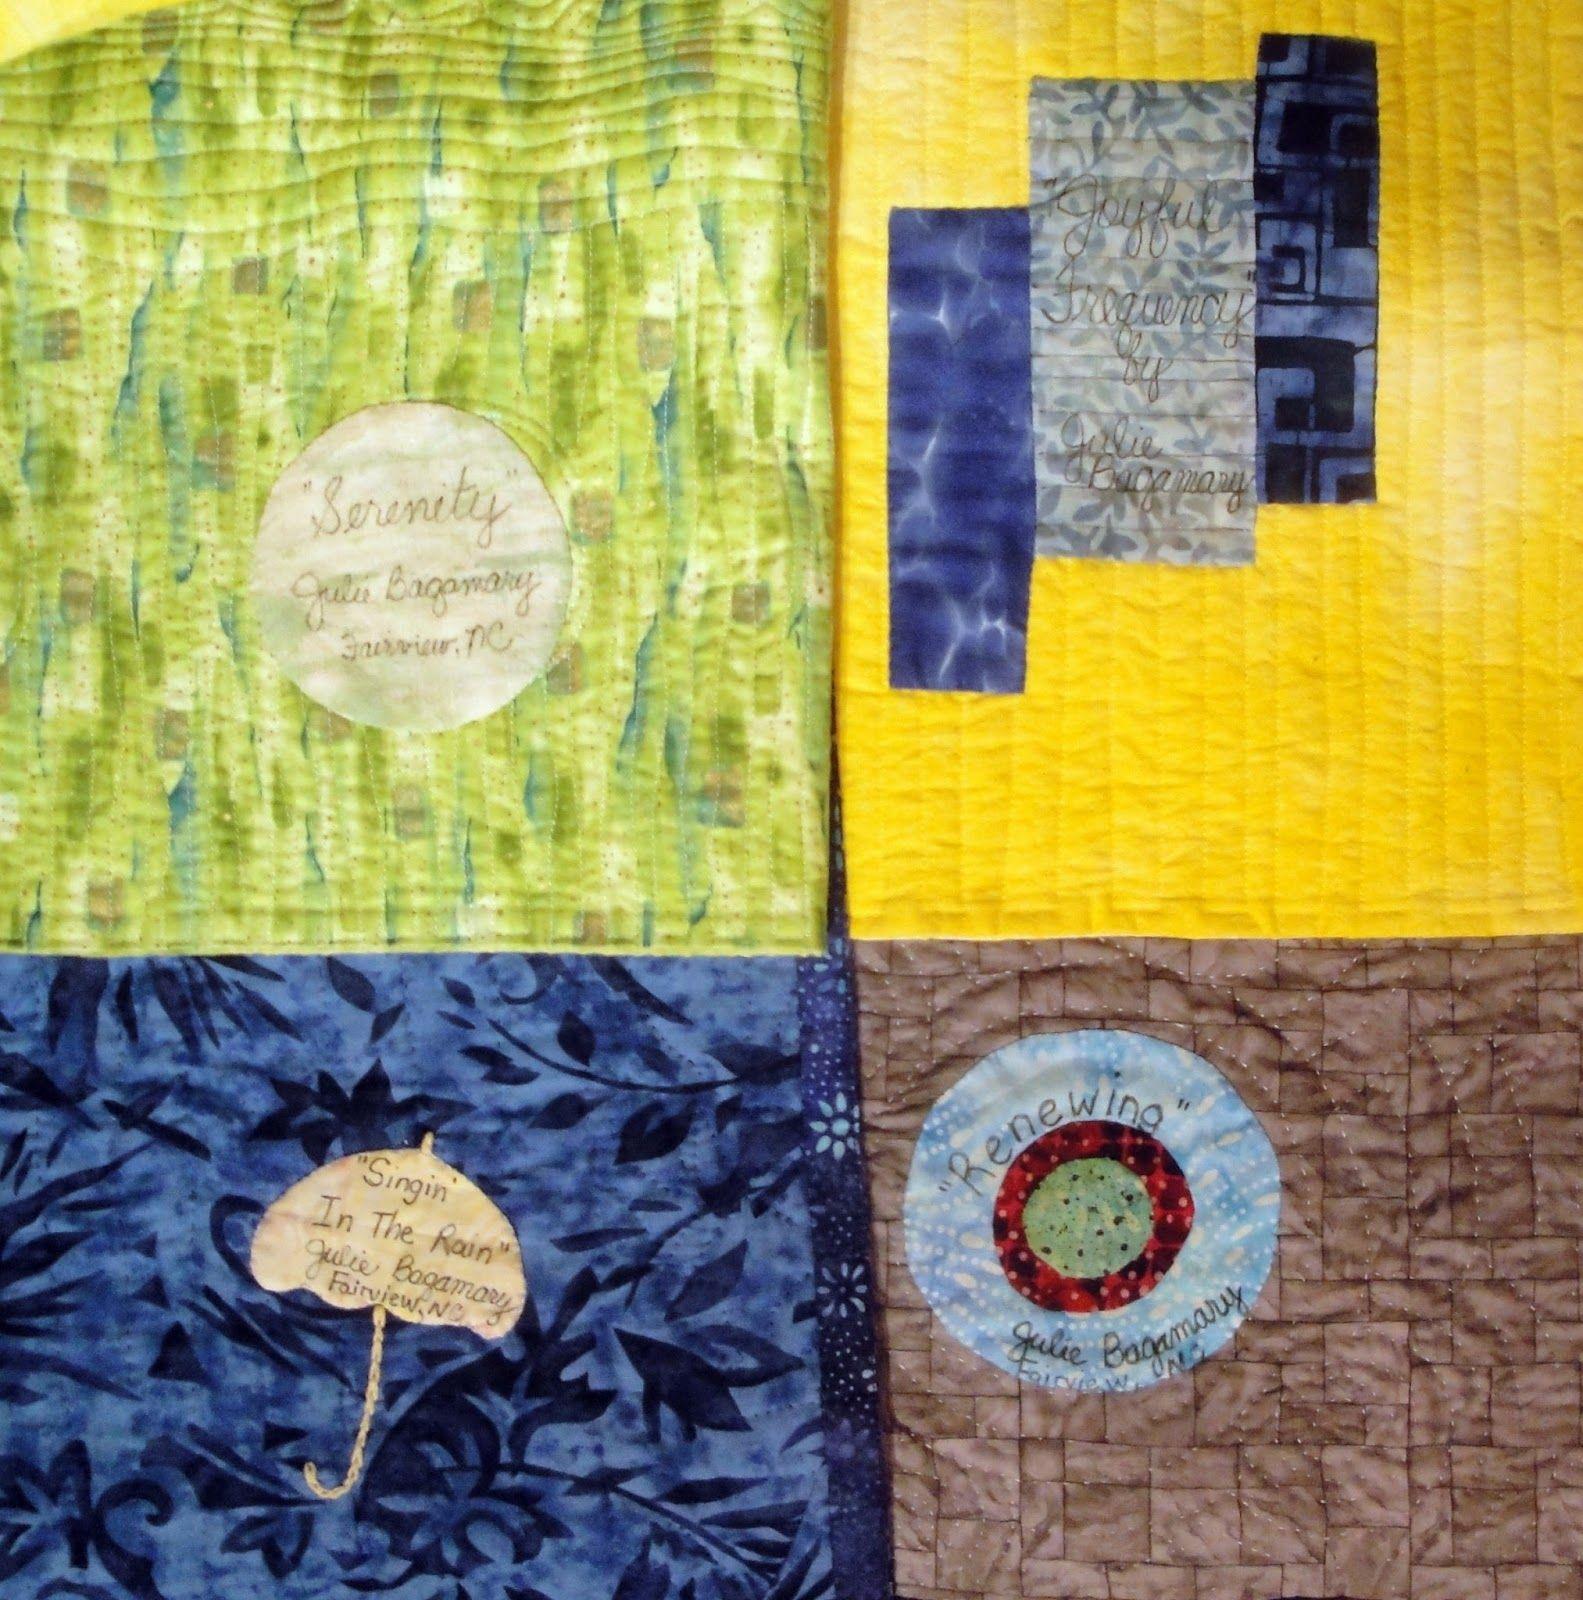 Julie Bagamary Art Asheville Quilt Guild Show Gallery 2015 Art